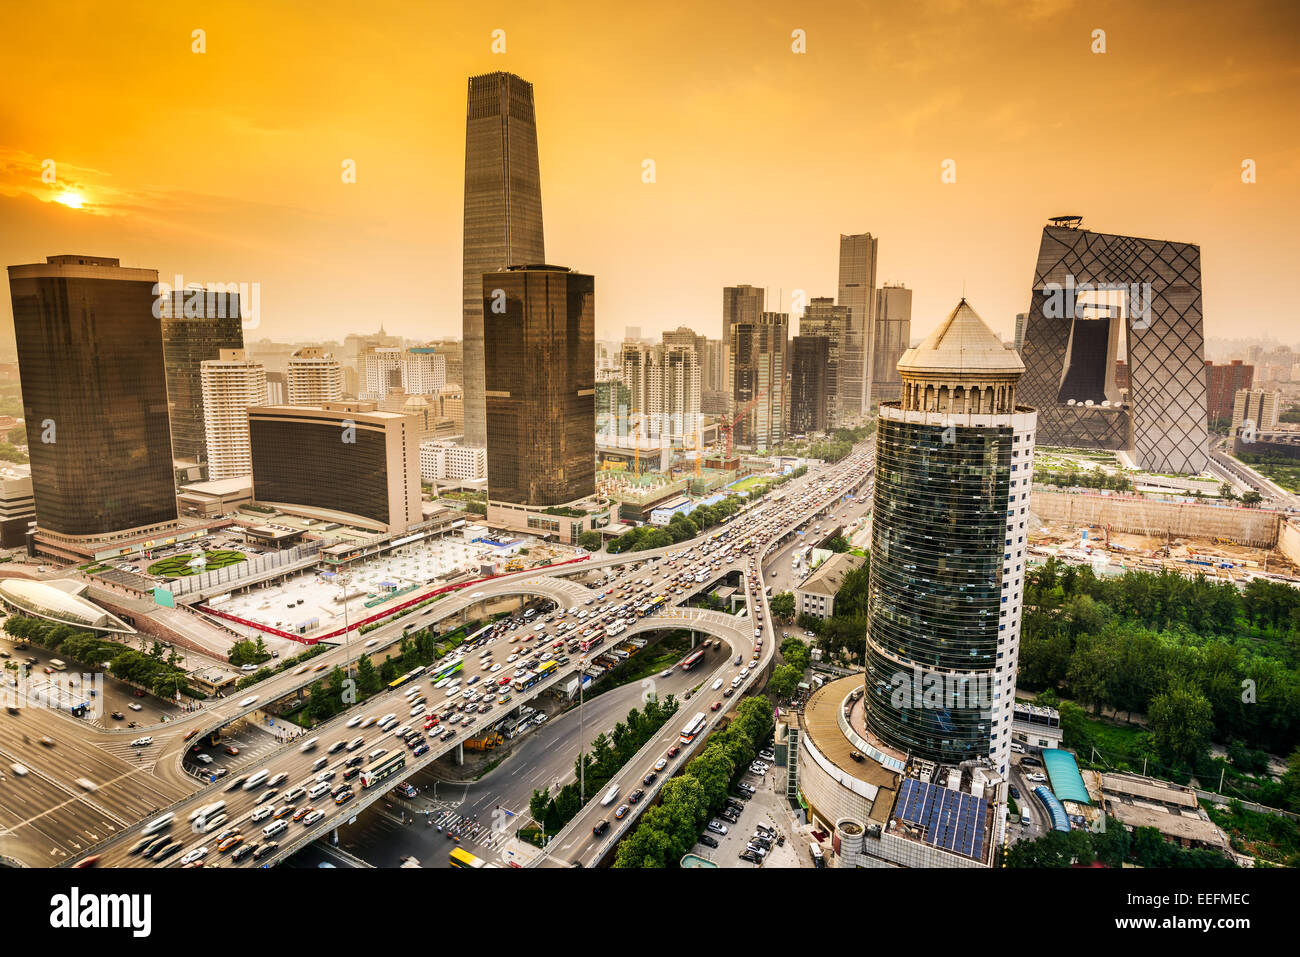 Beijing, China Financial District city skyline. - Stock Image